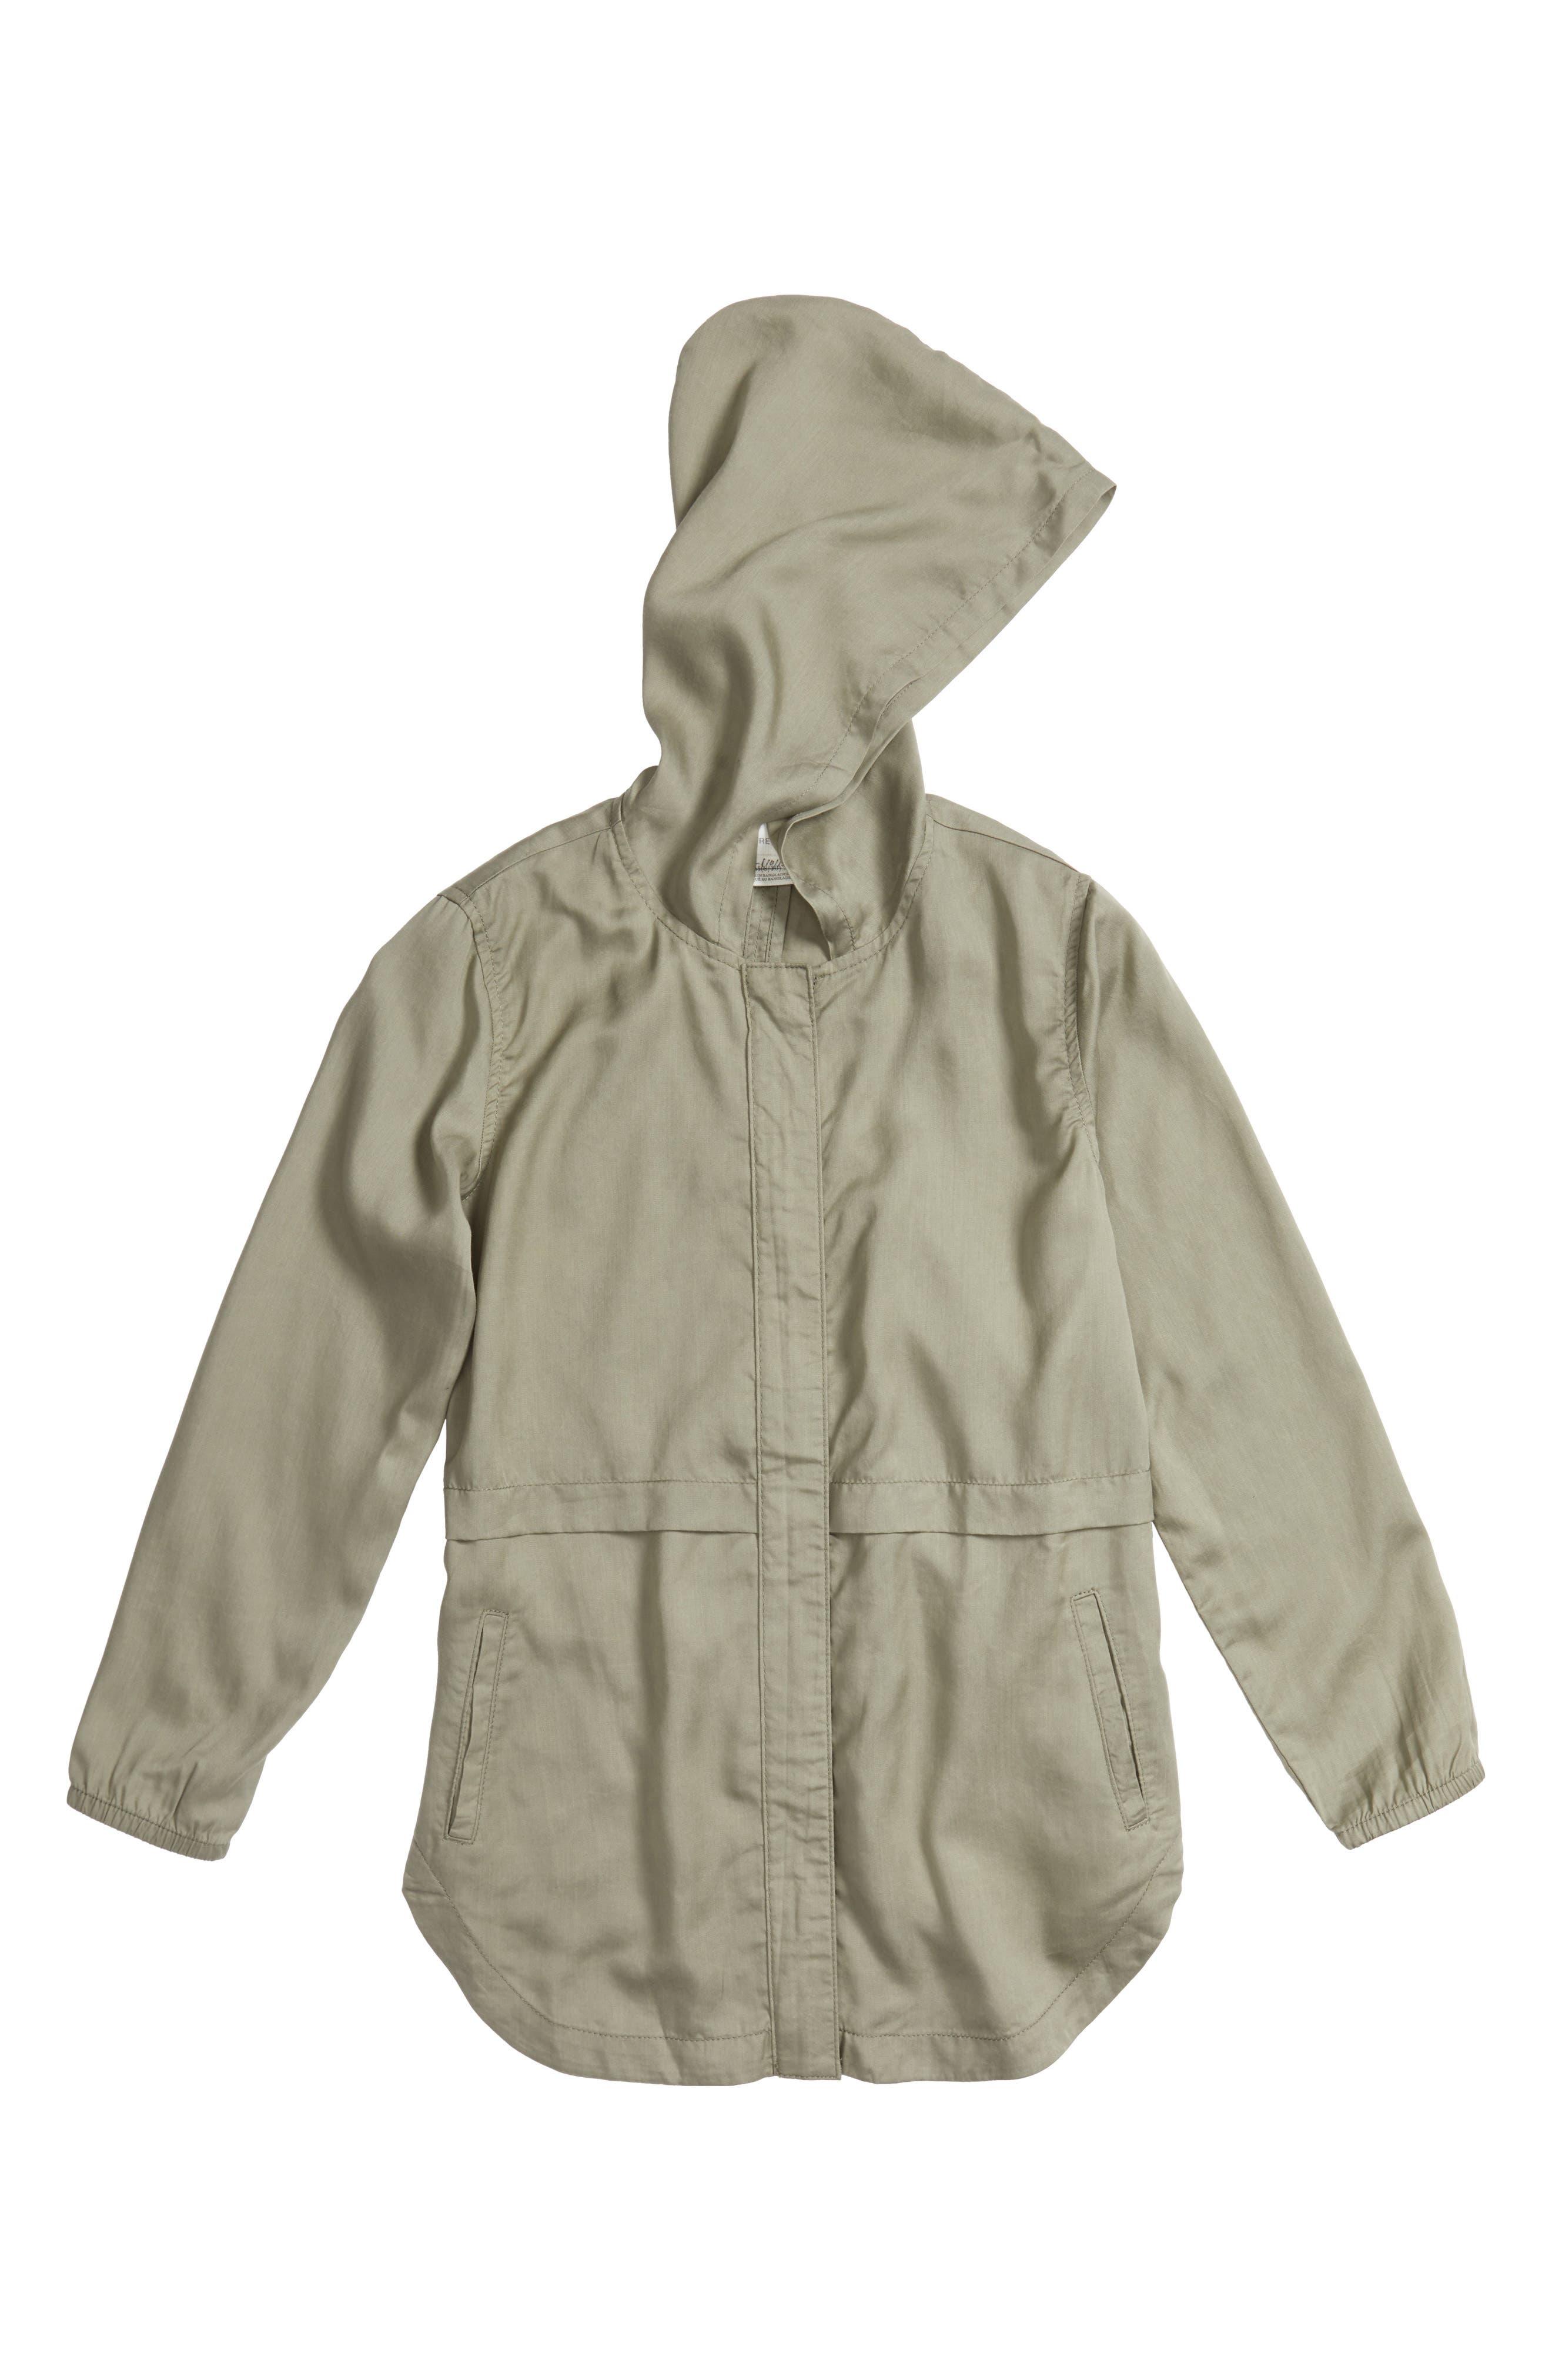 Alternate Image 1 Selected - Treasure & Bond Drapey Hooded Jacket (Big Girls)